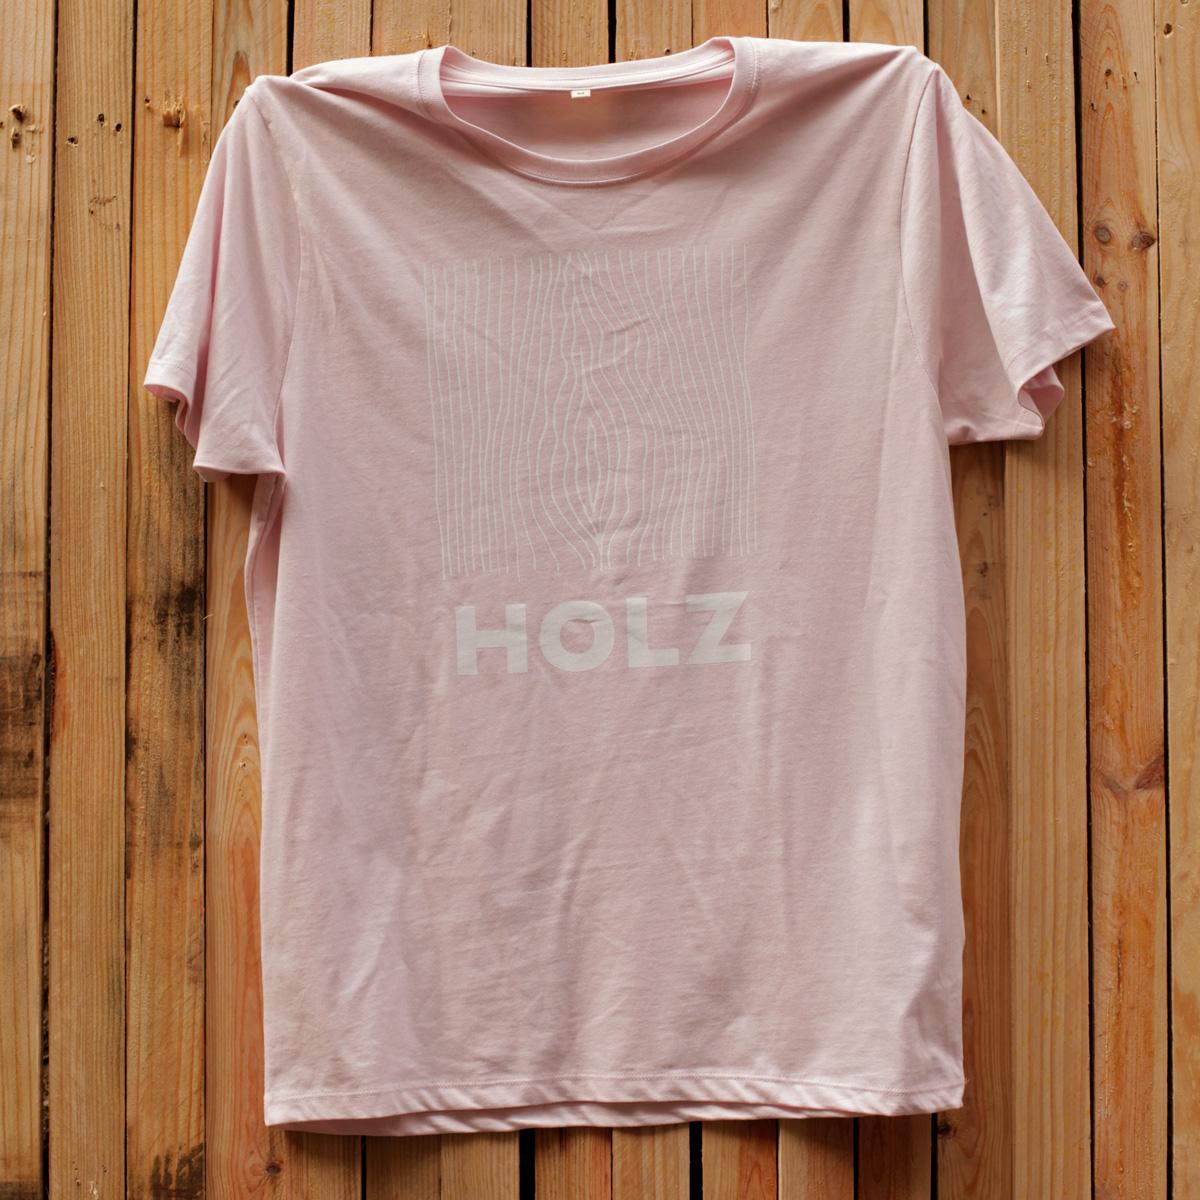 HOLZ Original T-Shirt Pink 1